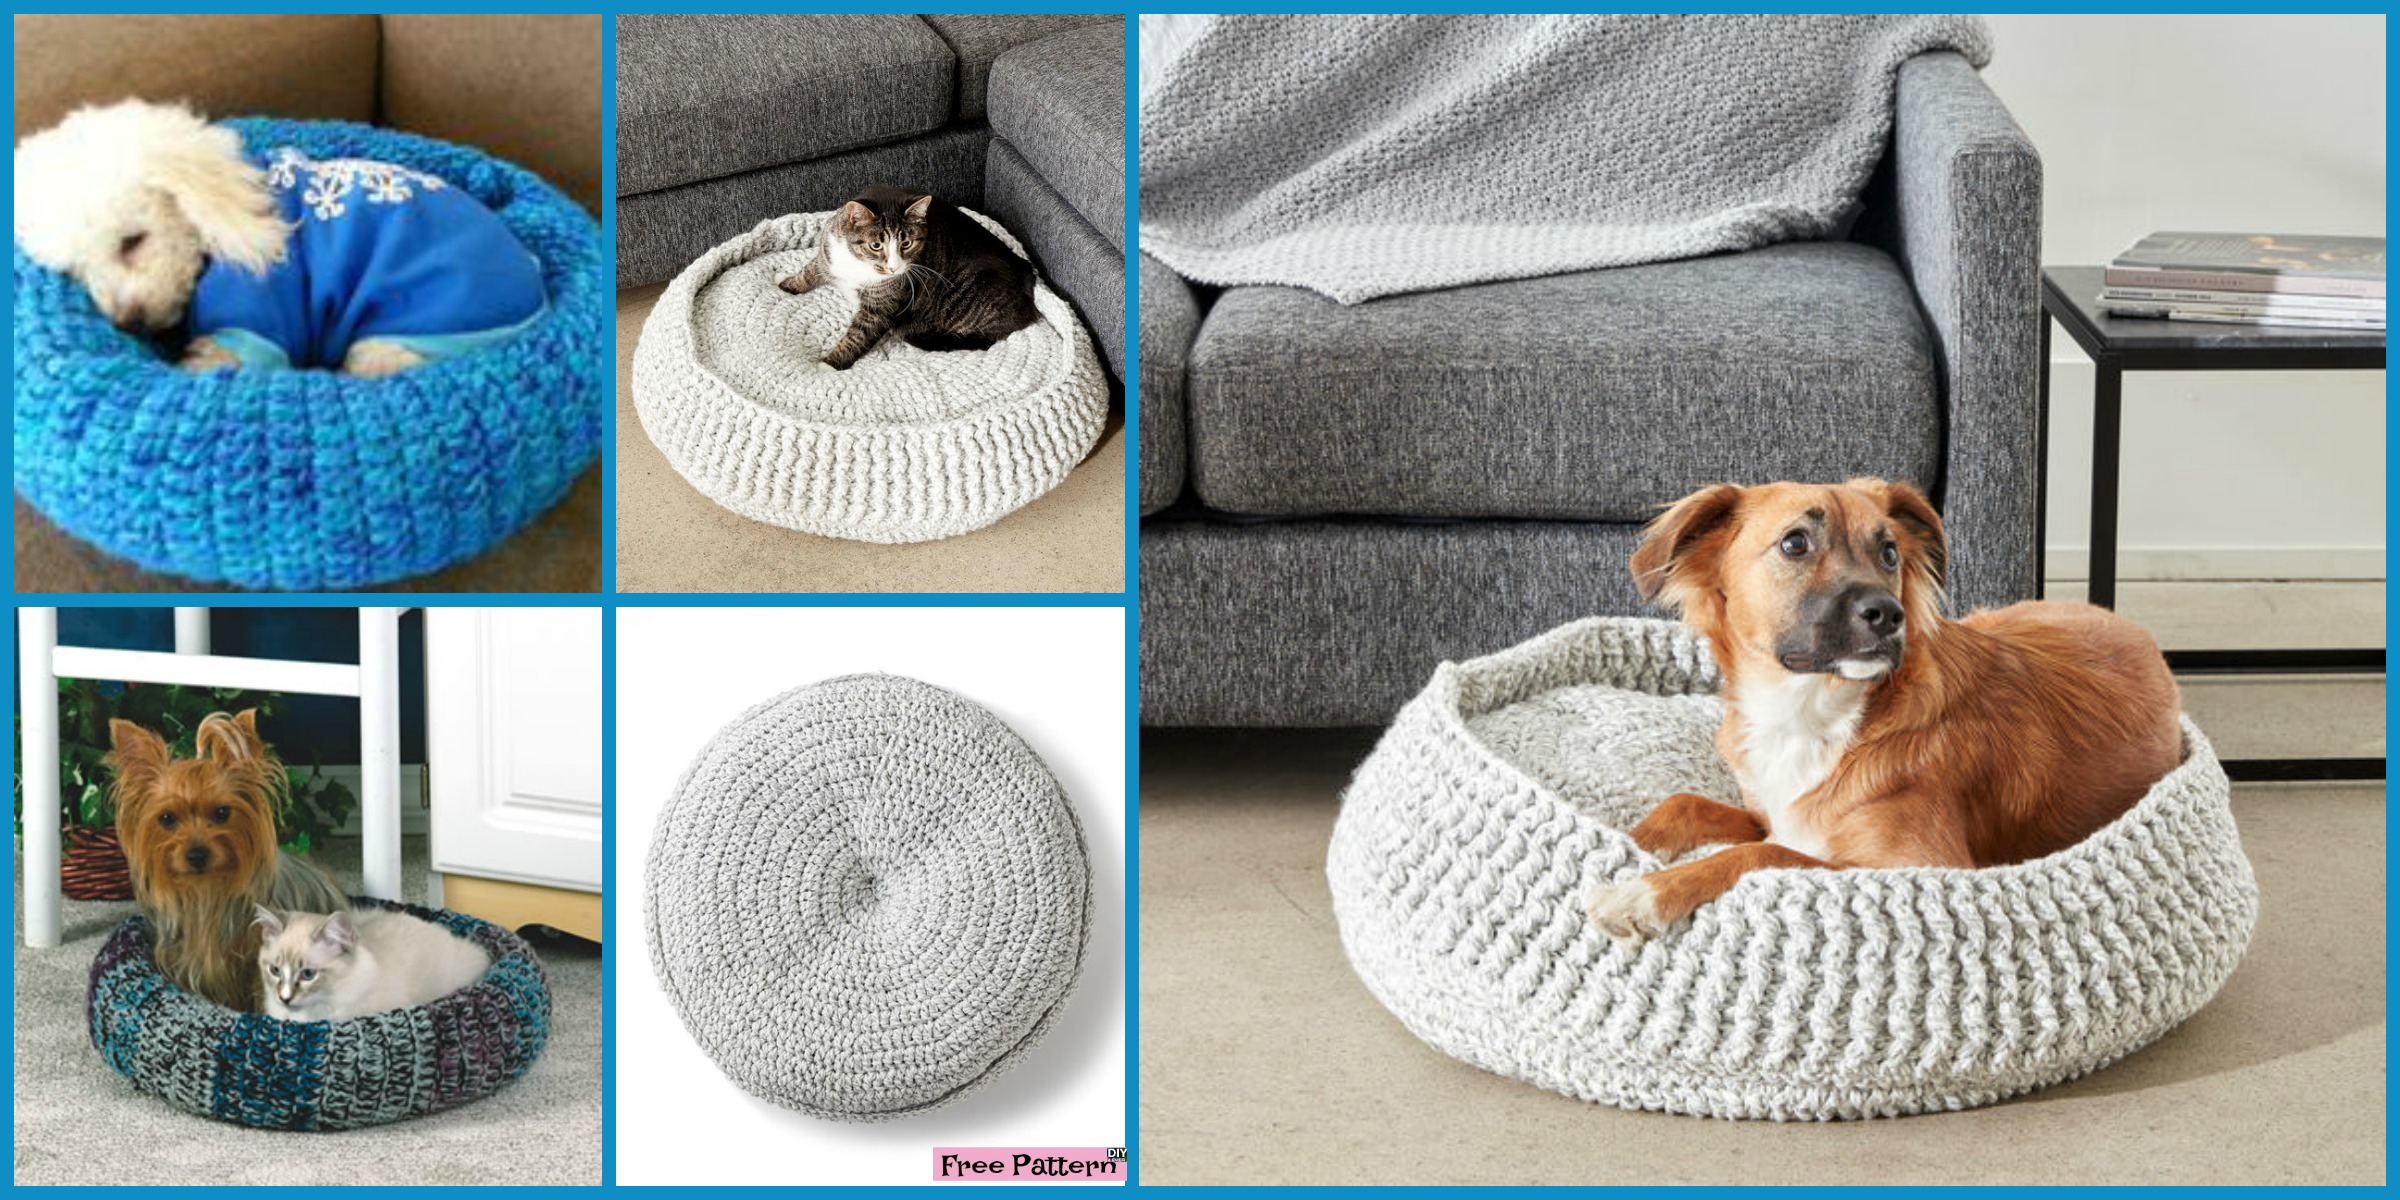 Crochet Dog Neck Warmer Free Patterns Knitting